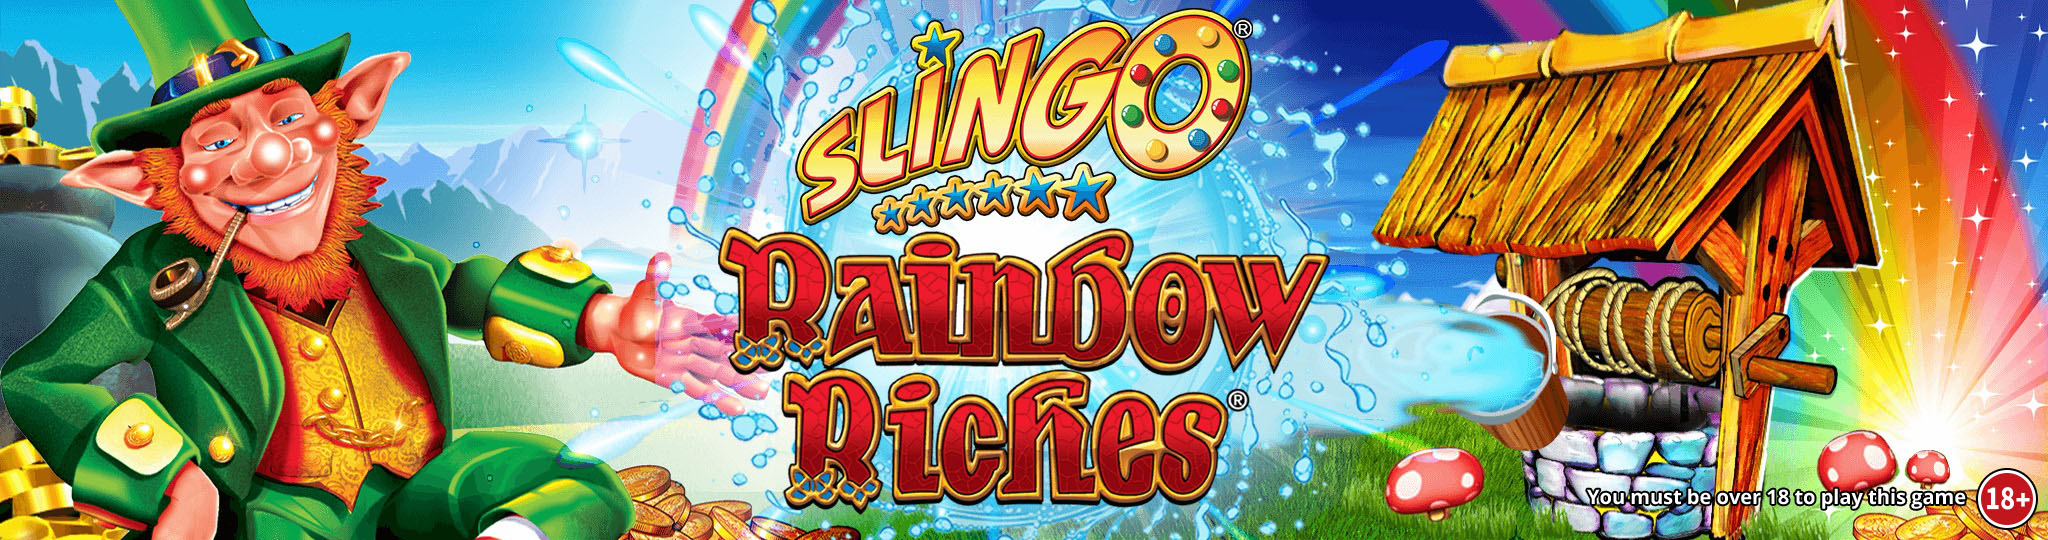 Slingo Rainbow Riches Slot Thor Slots